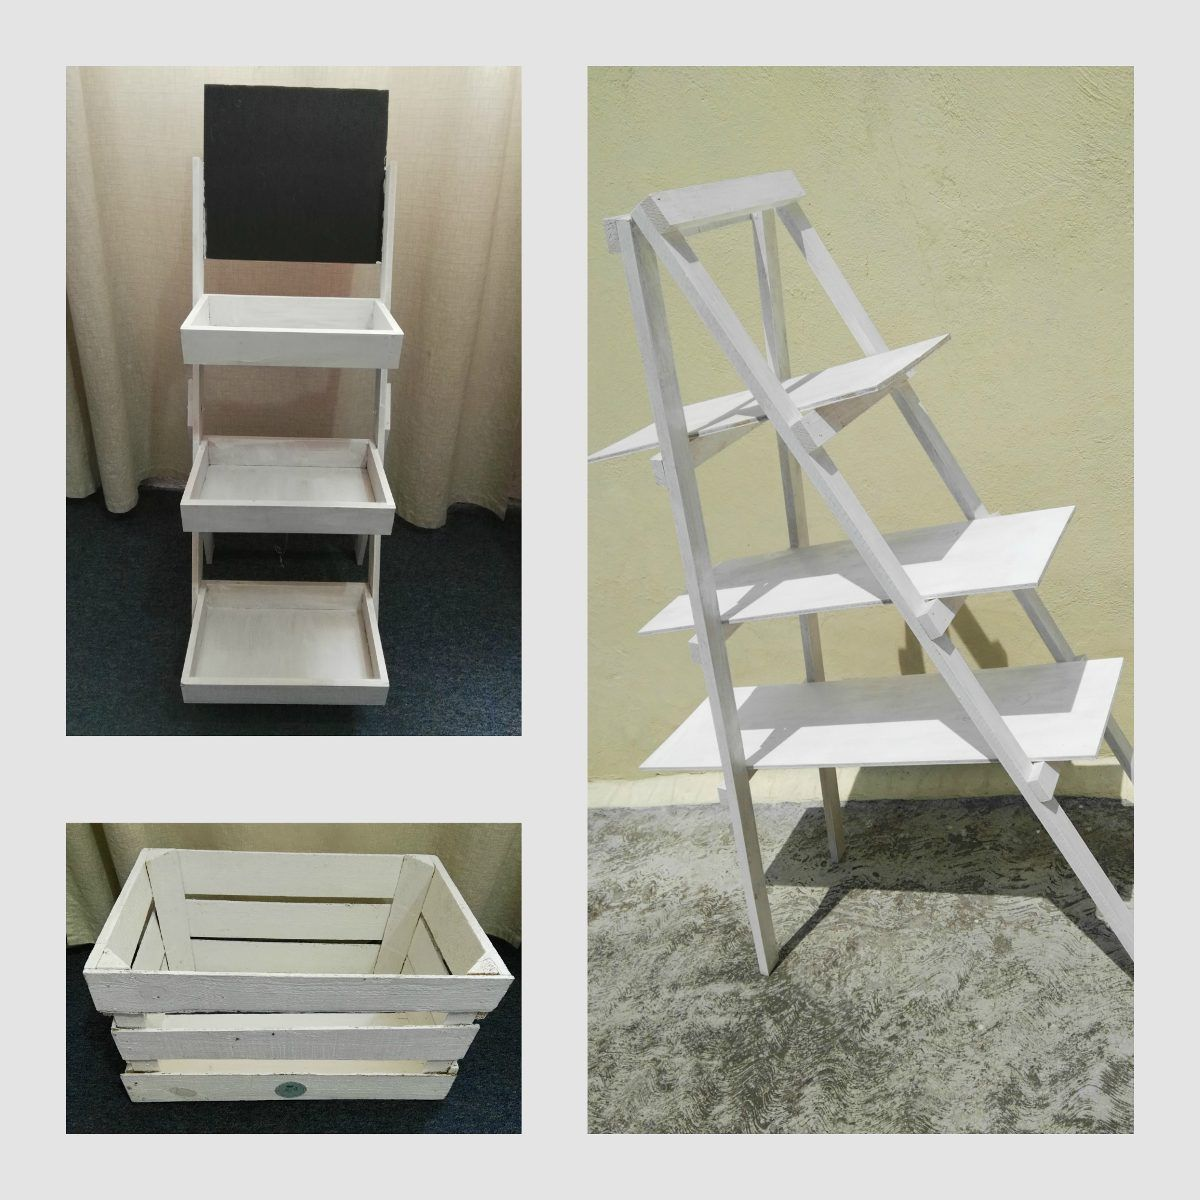 mobiliario candy bar, mesa de dulces paquete | Bases | Pinterest ...